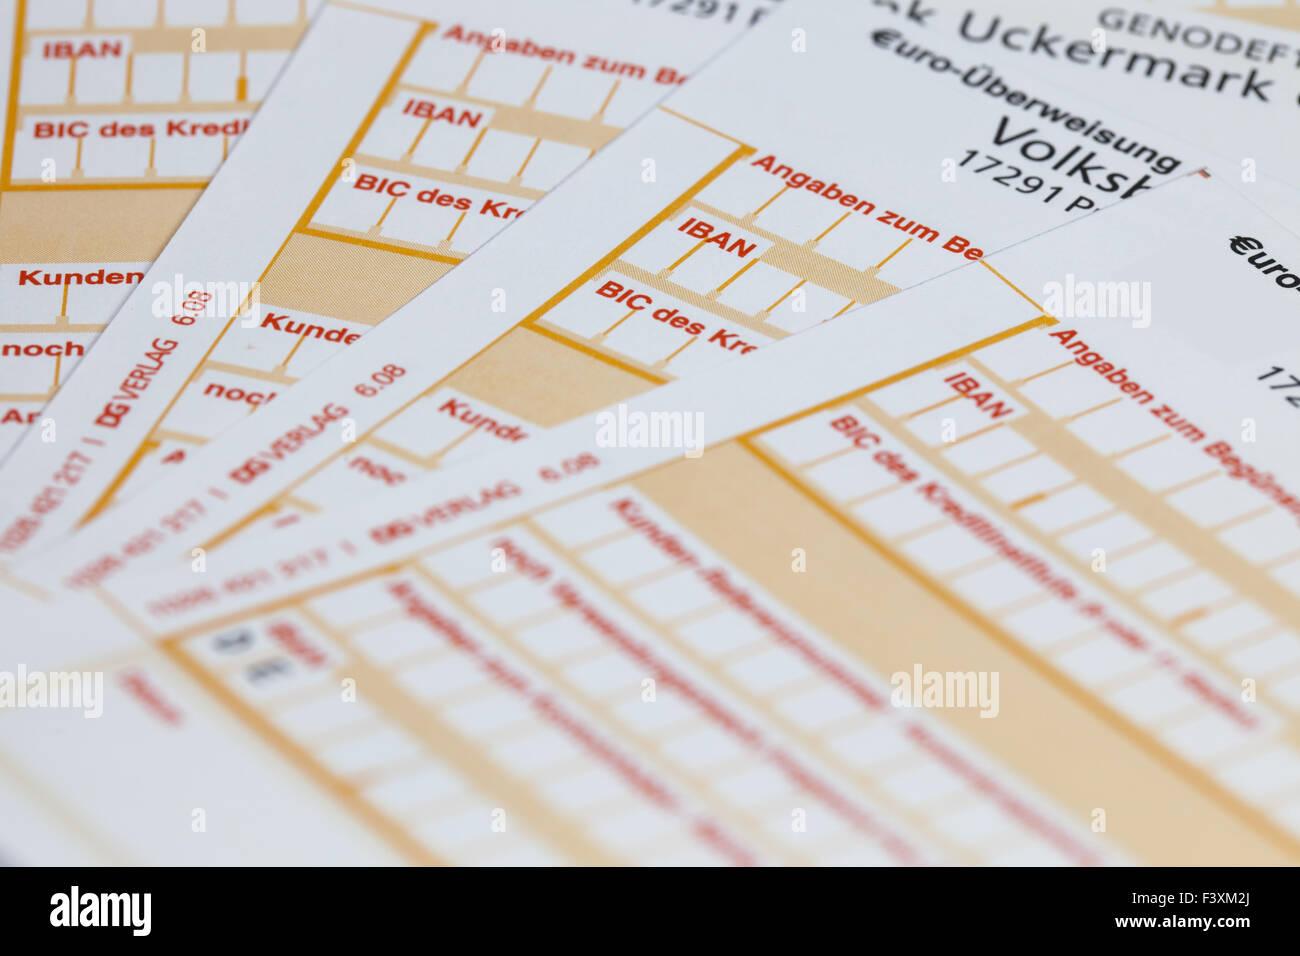 IBAN Transfer form Stock Photo: 88482314 - Alamy